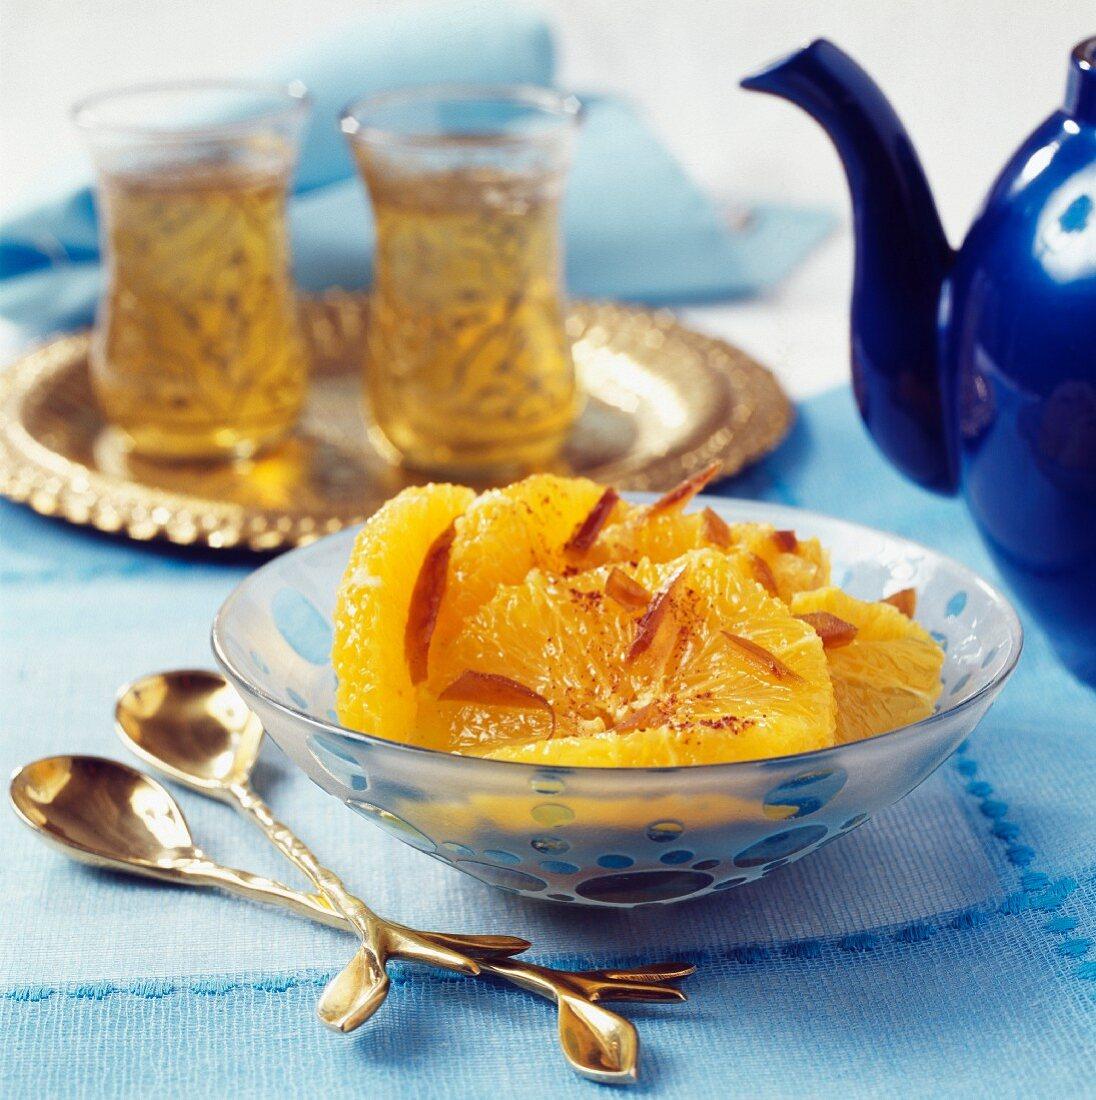 Moroccan-style orange fruit salad